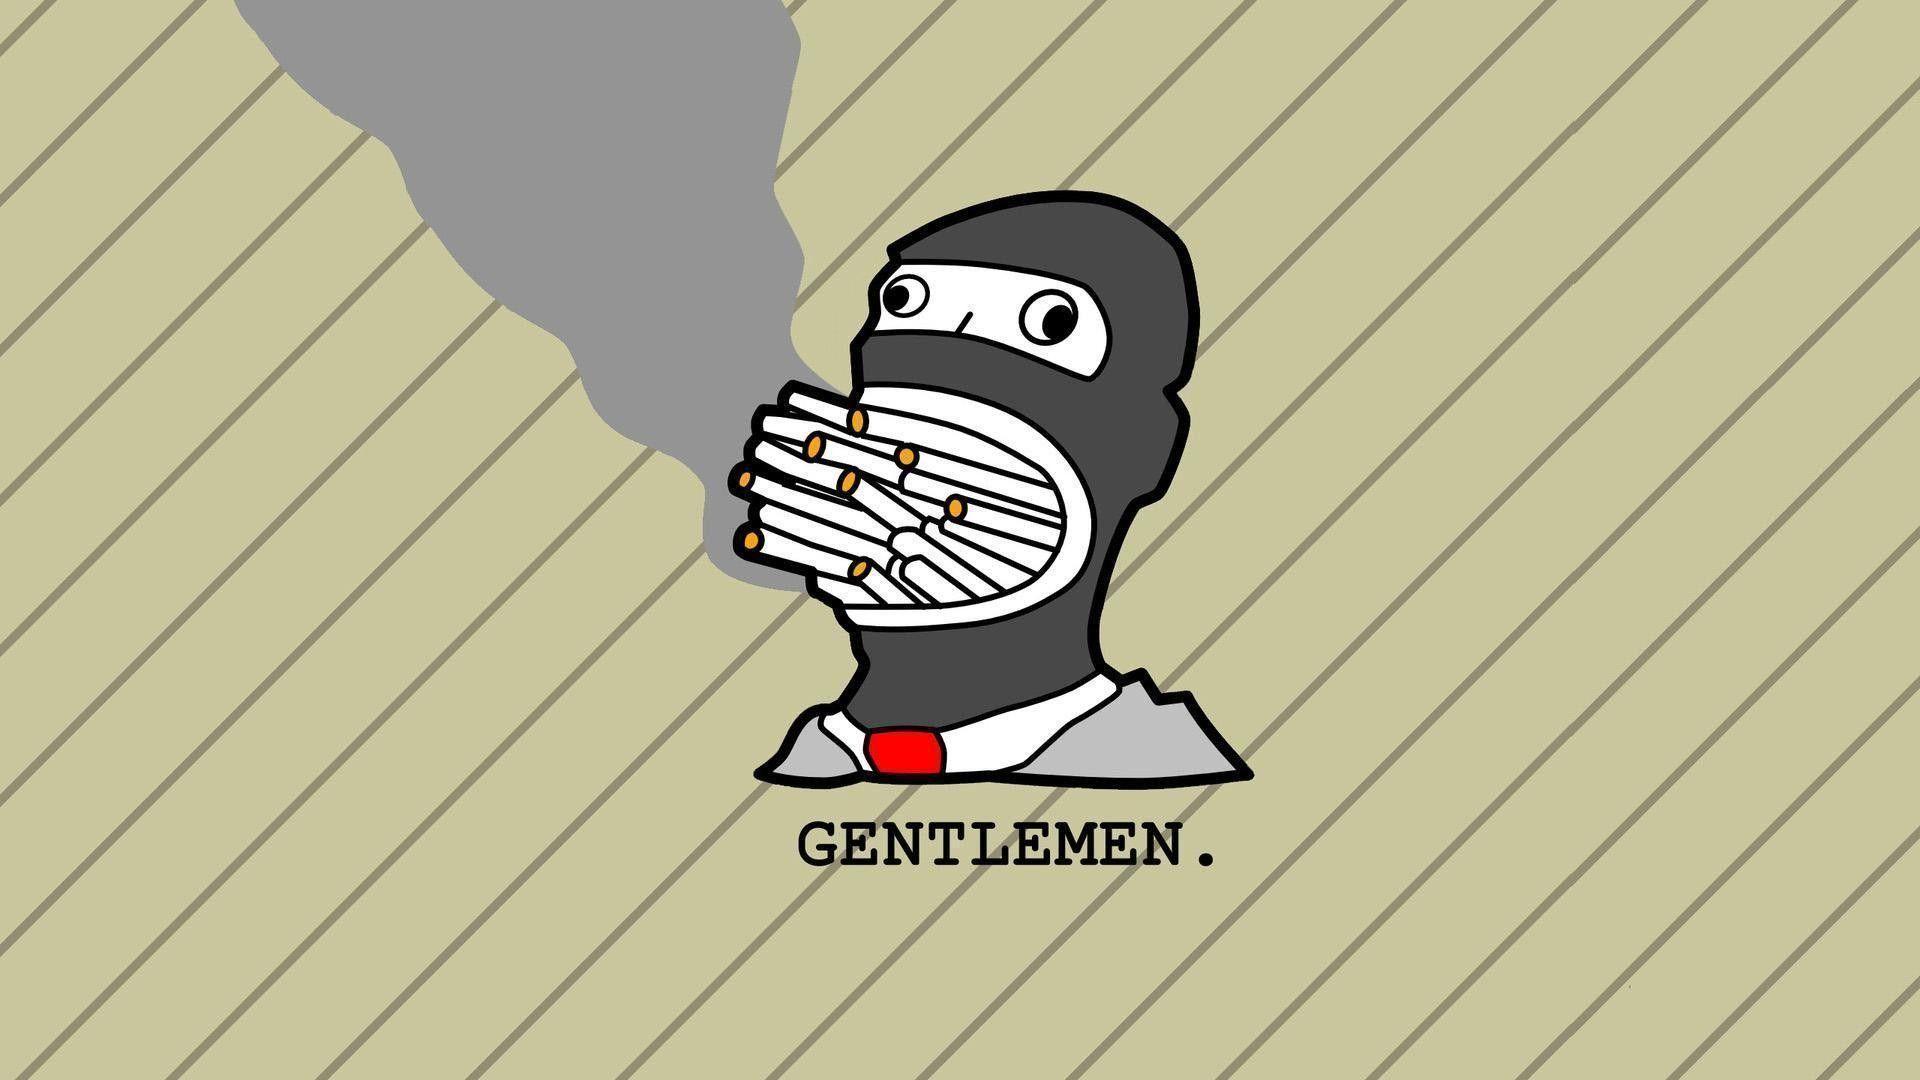 Meme Wallpapers   Top Meme Backgrounds   WallpaperAccess 1920x1080